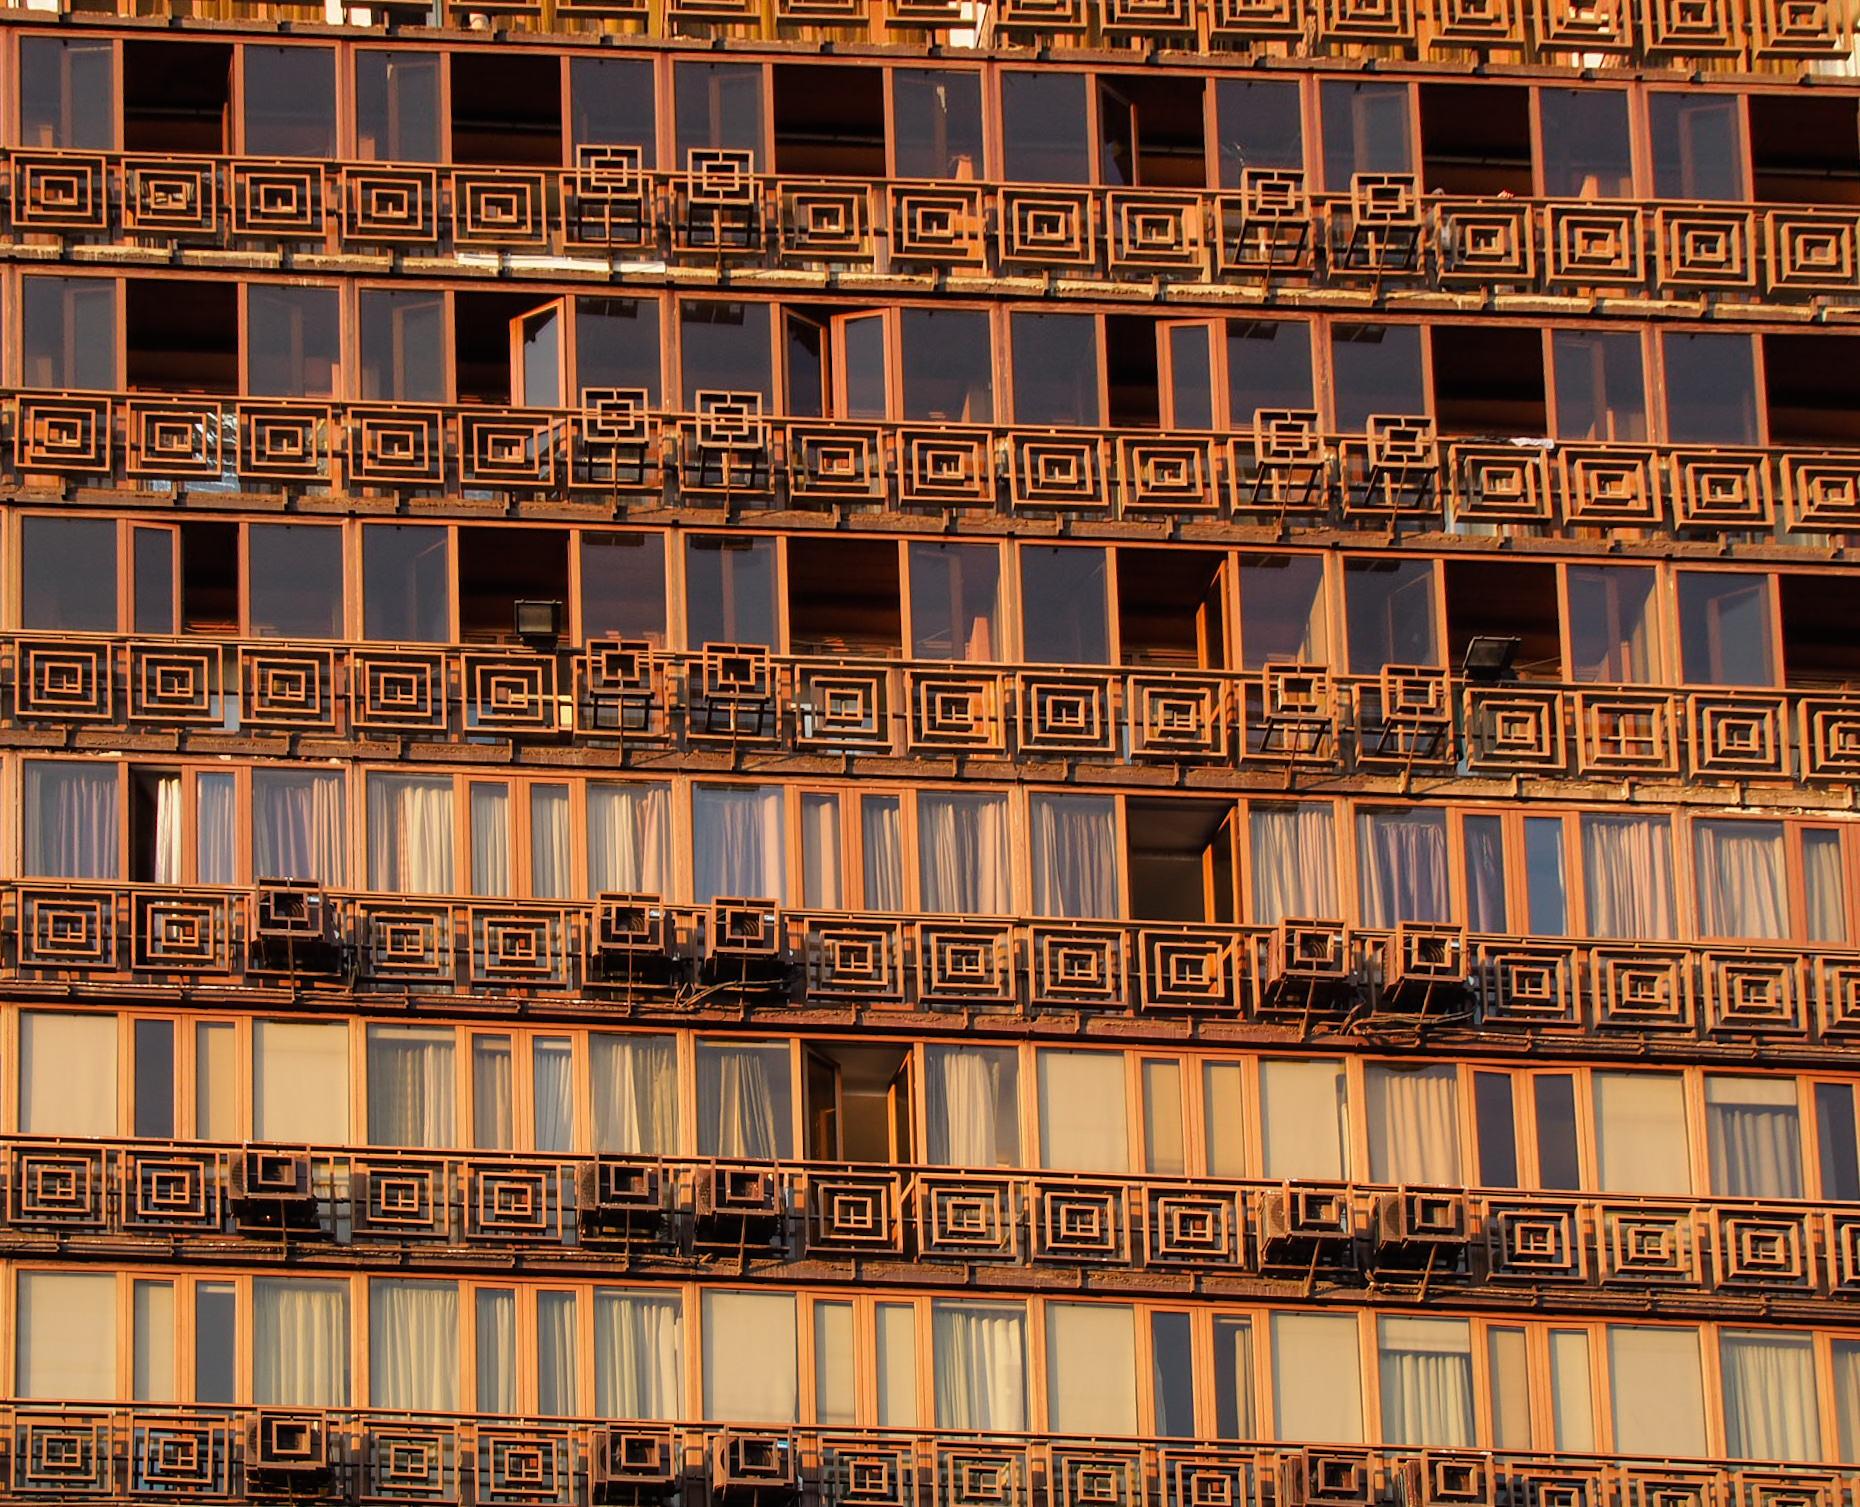 soviet-housing-block-yerevan.jpeg